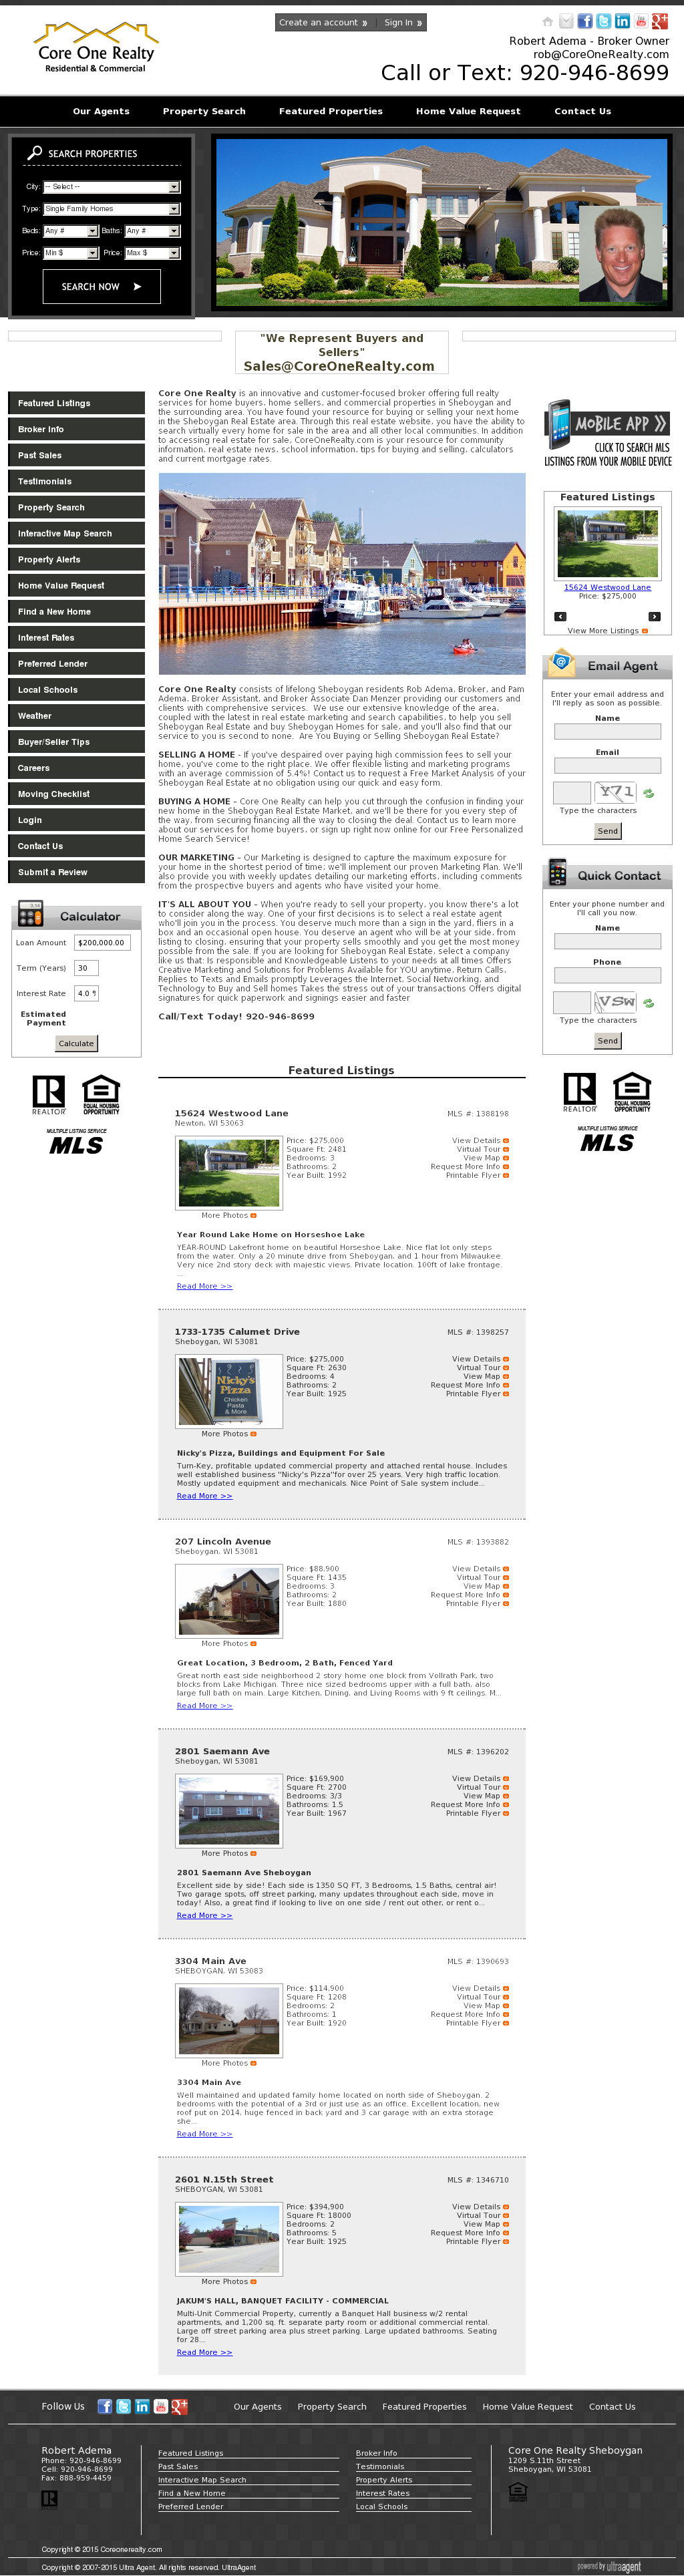 sheboygan dating site Search this site university of  academic calendar 2017-2018 academic year  sheboygan, wi 53081 phone: 920-459-6600 fax: 920-459-6602 follow us.